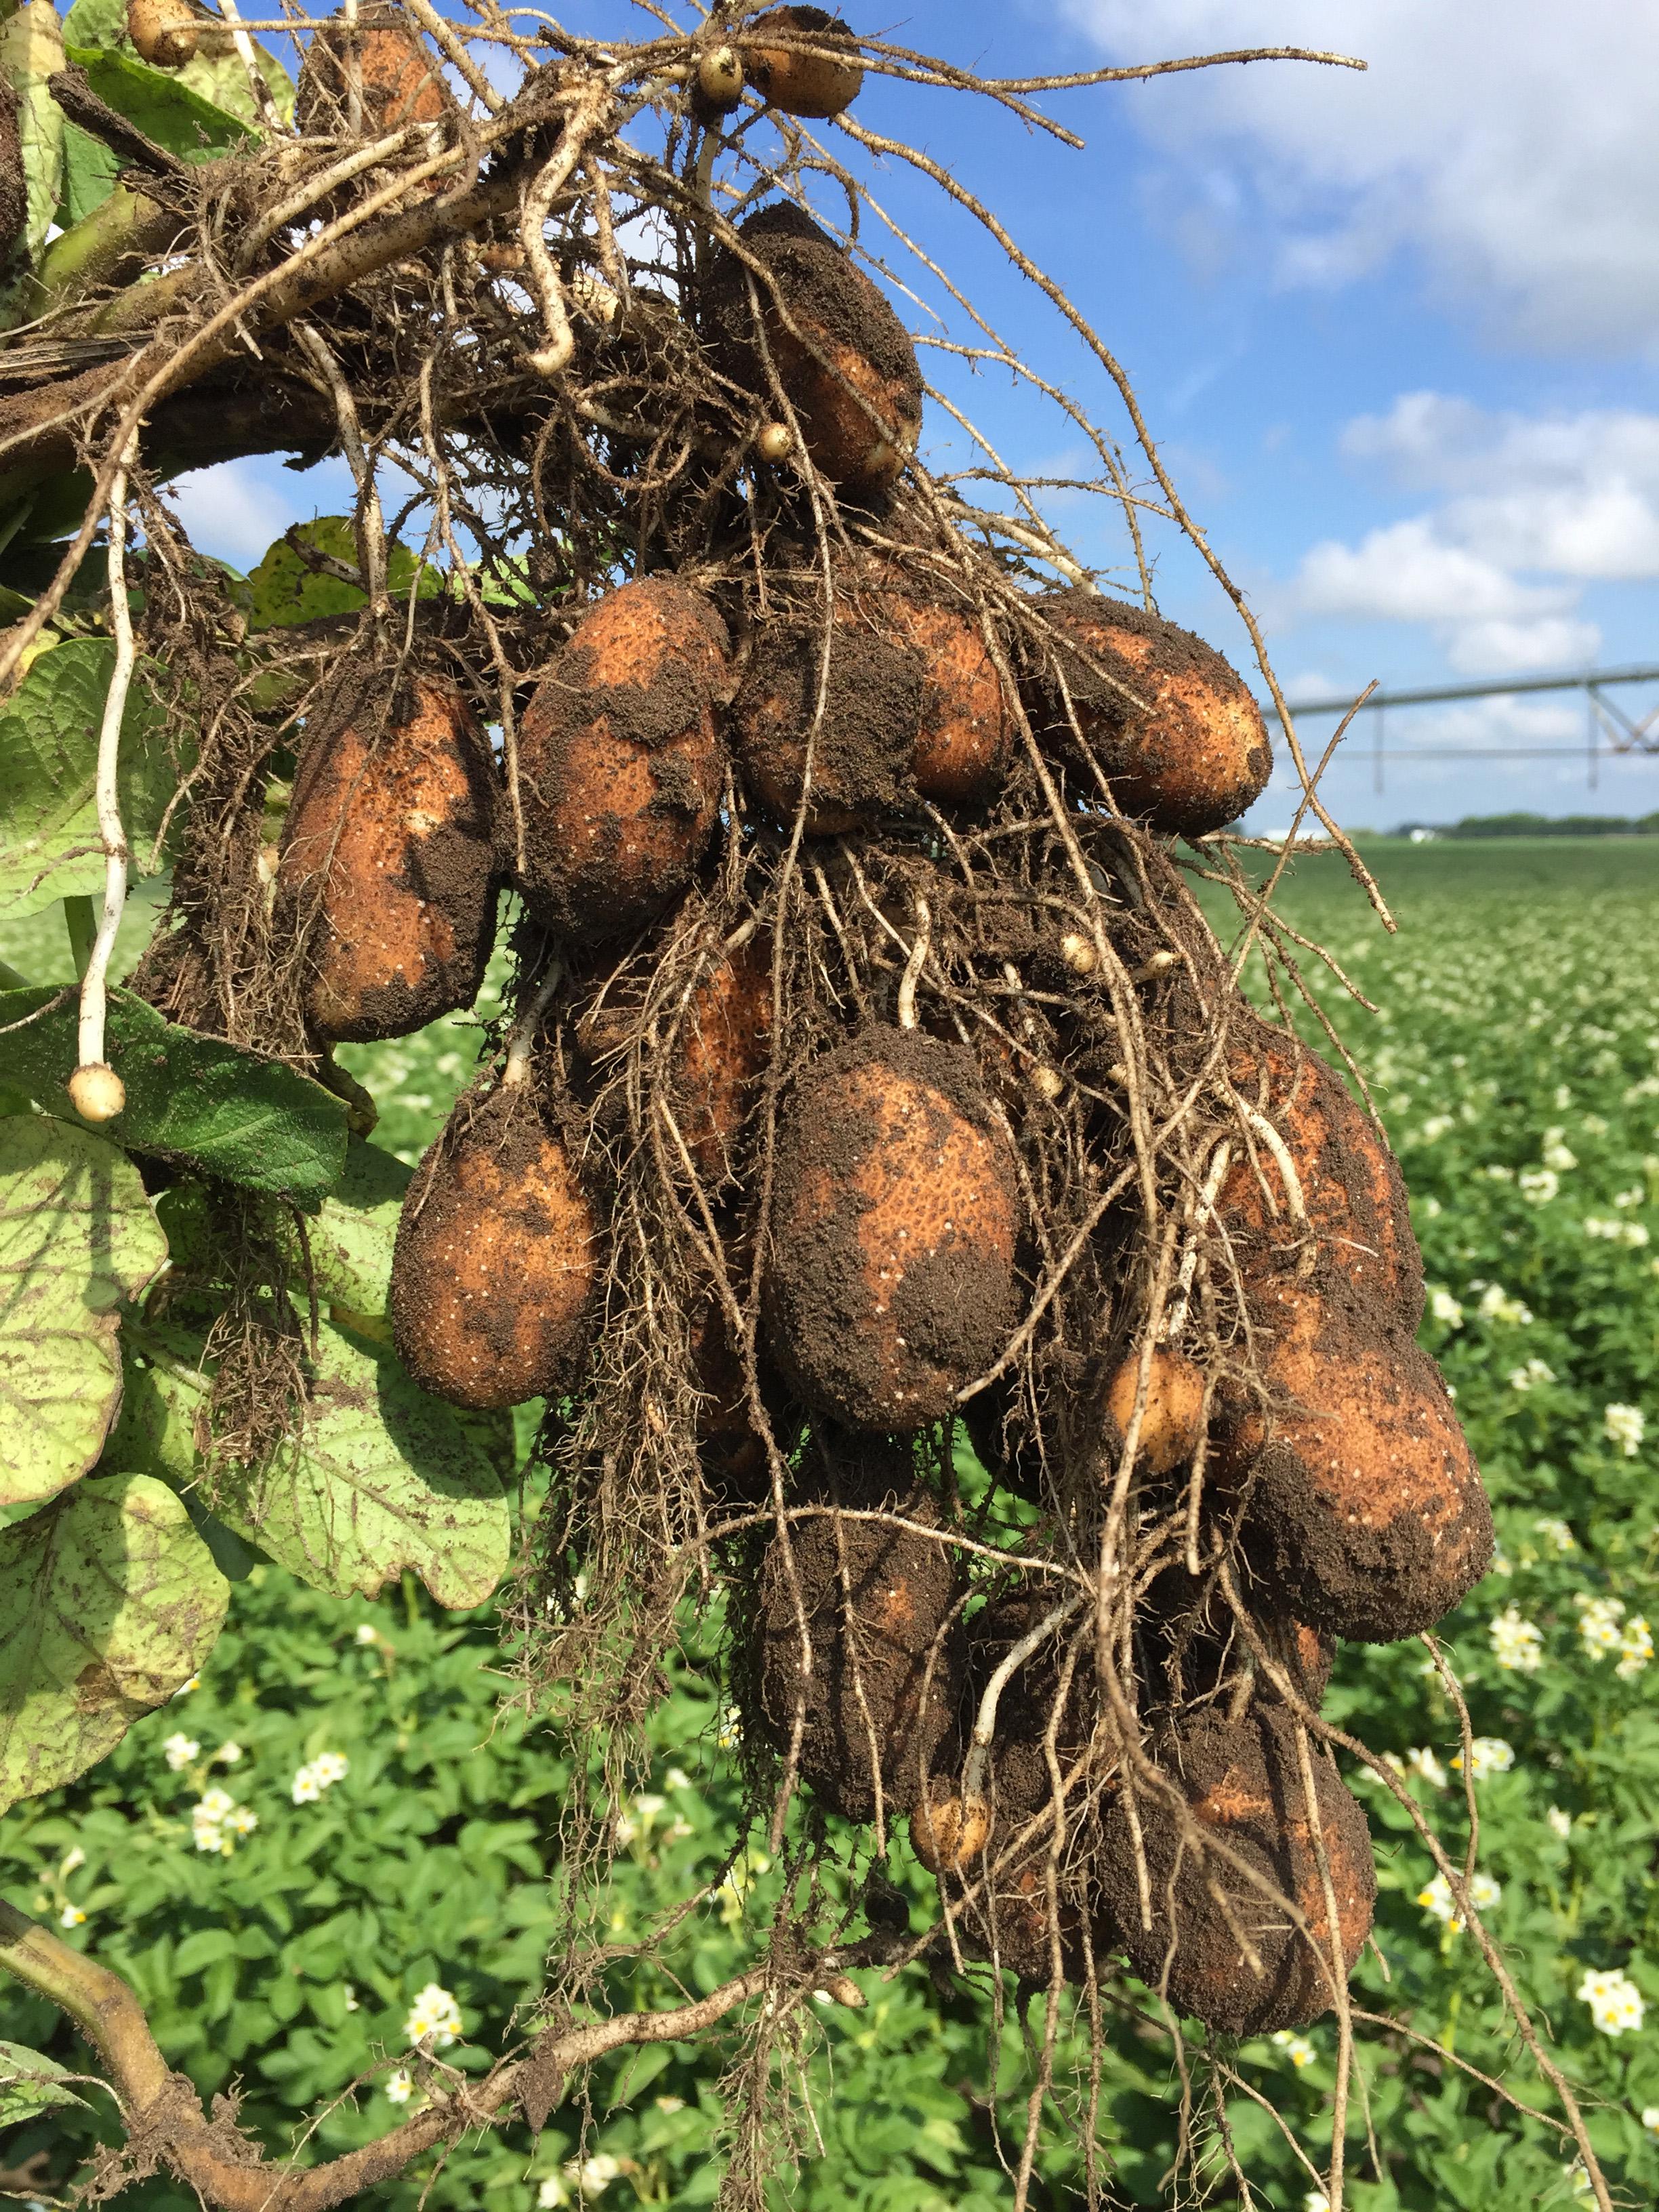 Potato tubers on vine 2-3